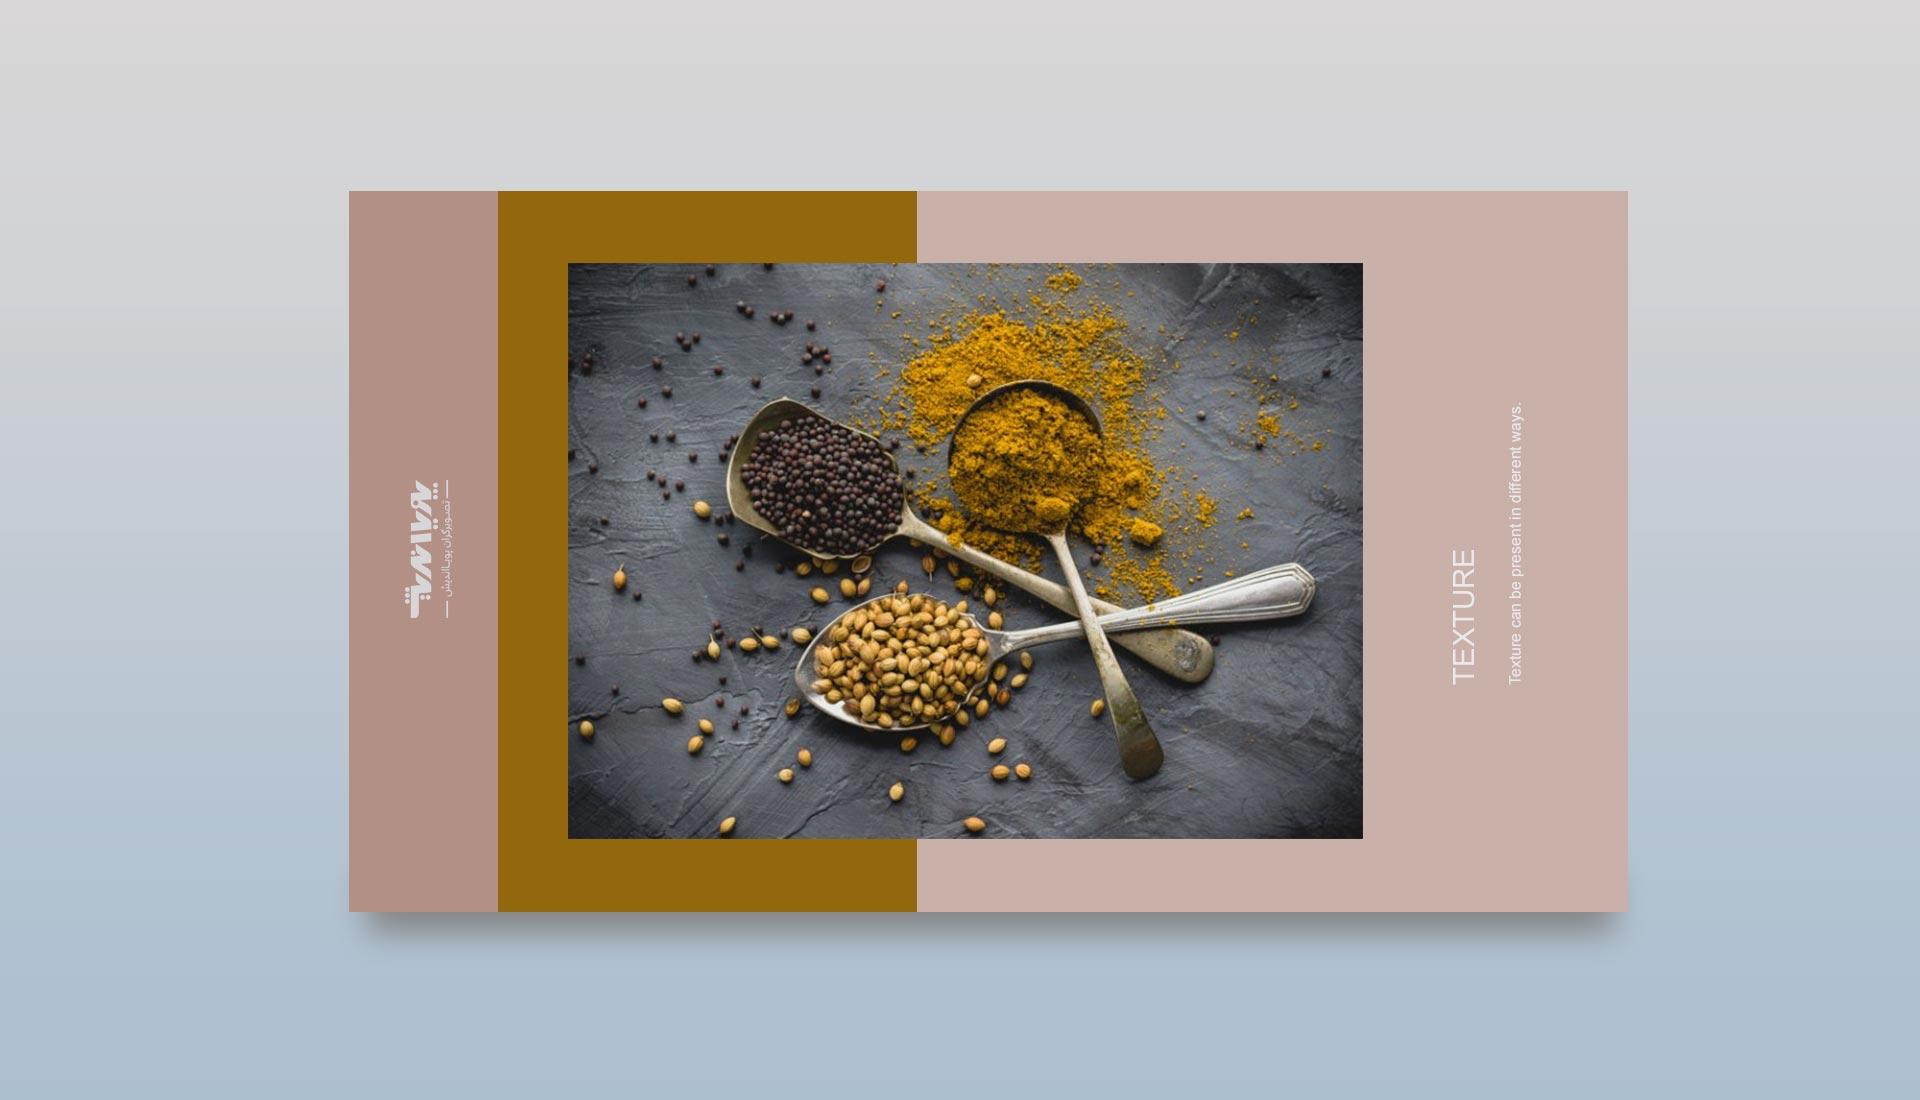 texture in photography - تعادل در عکاسی